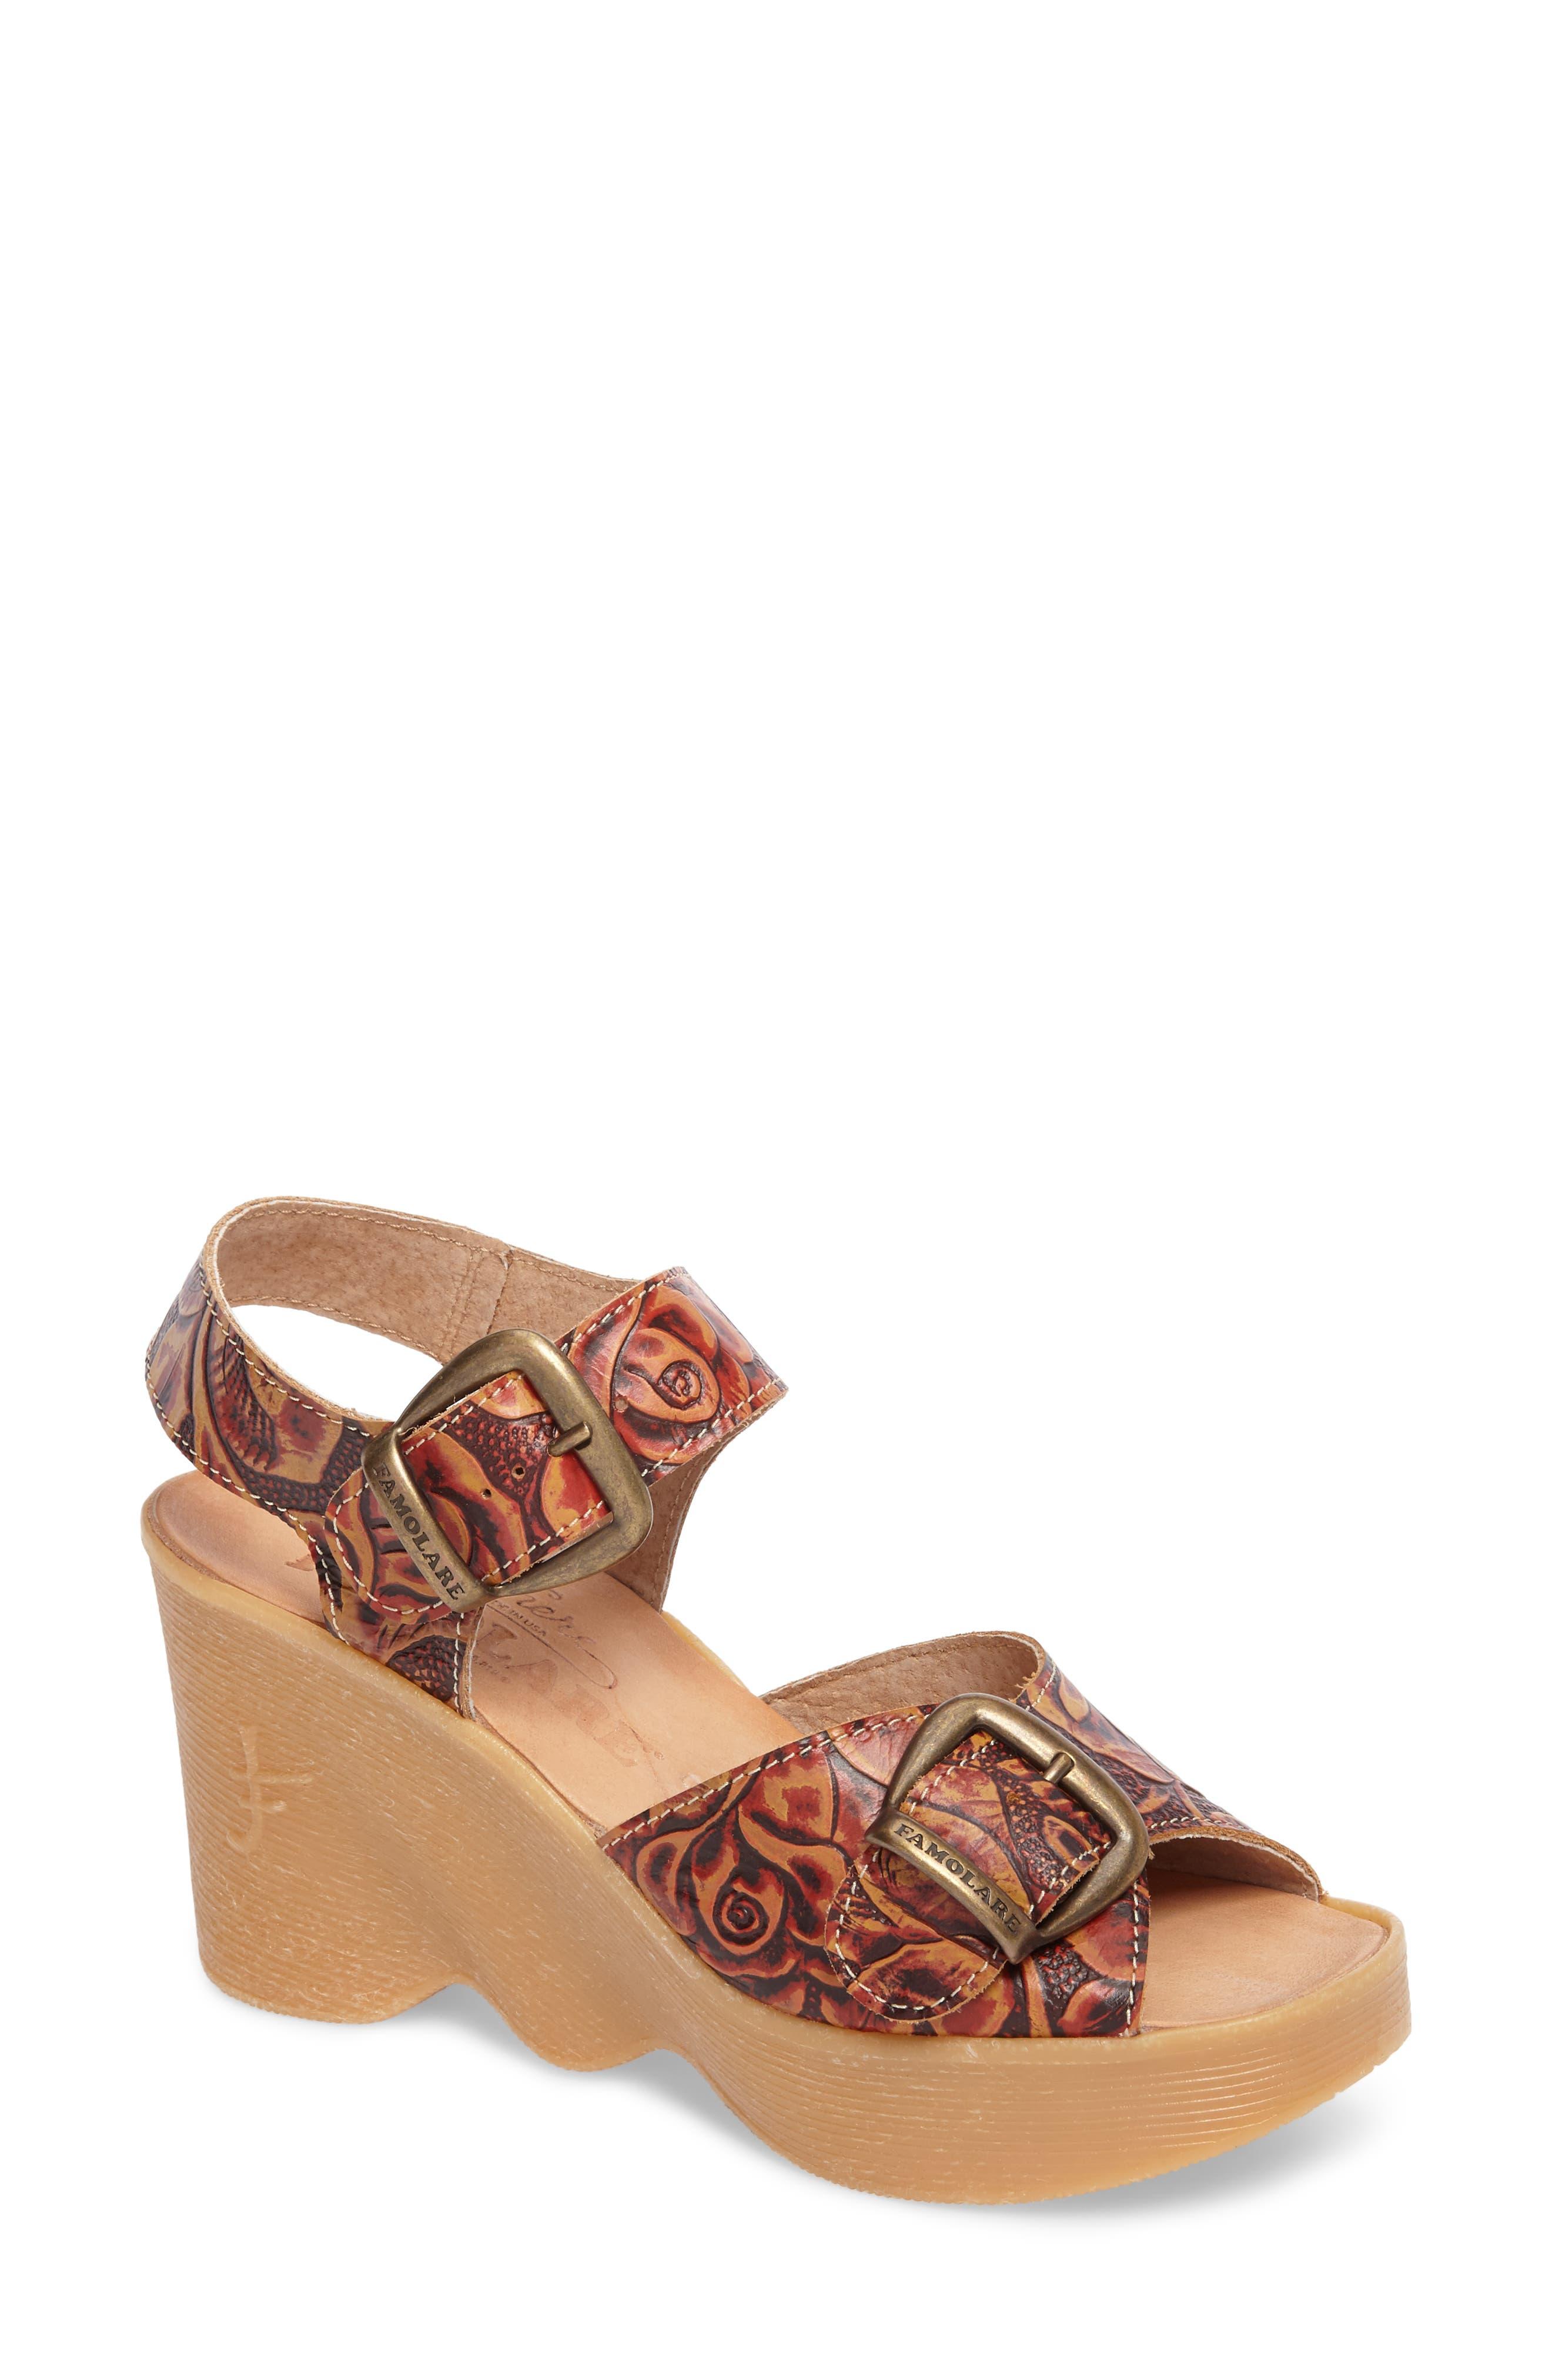 Alternate Image 1 Selected - Famolare Double Vision Wedge Sandal (Women)